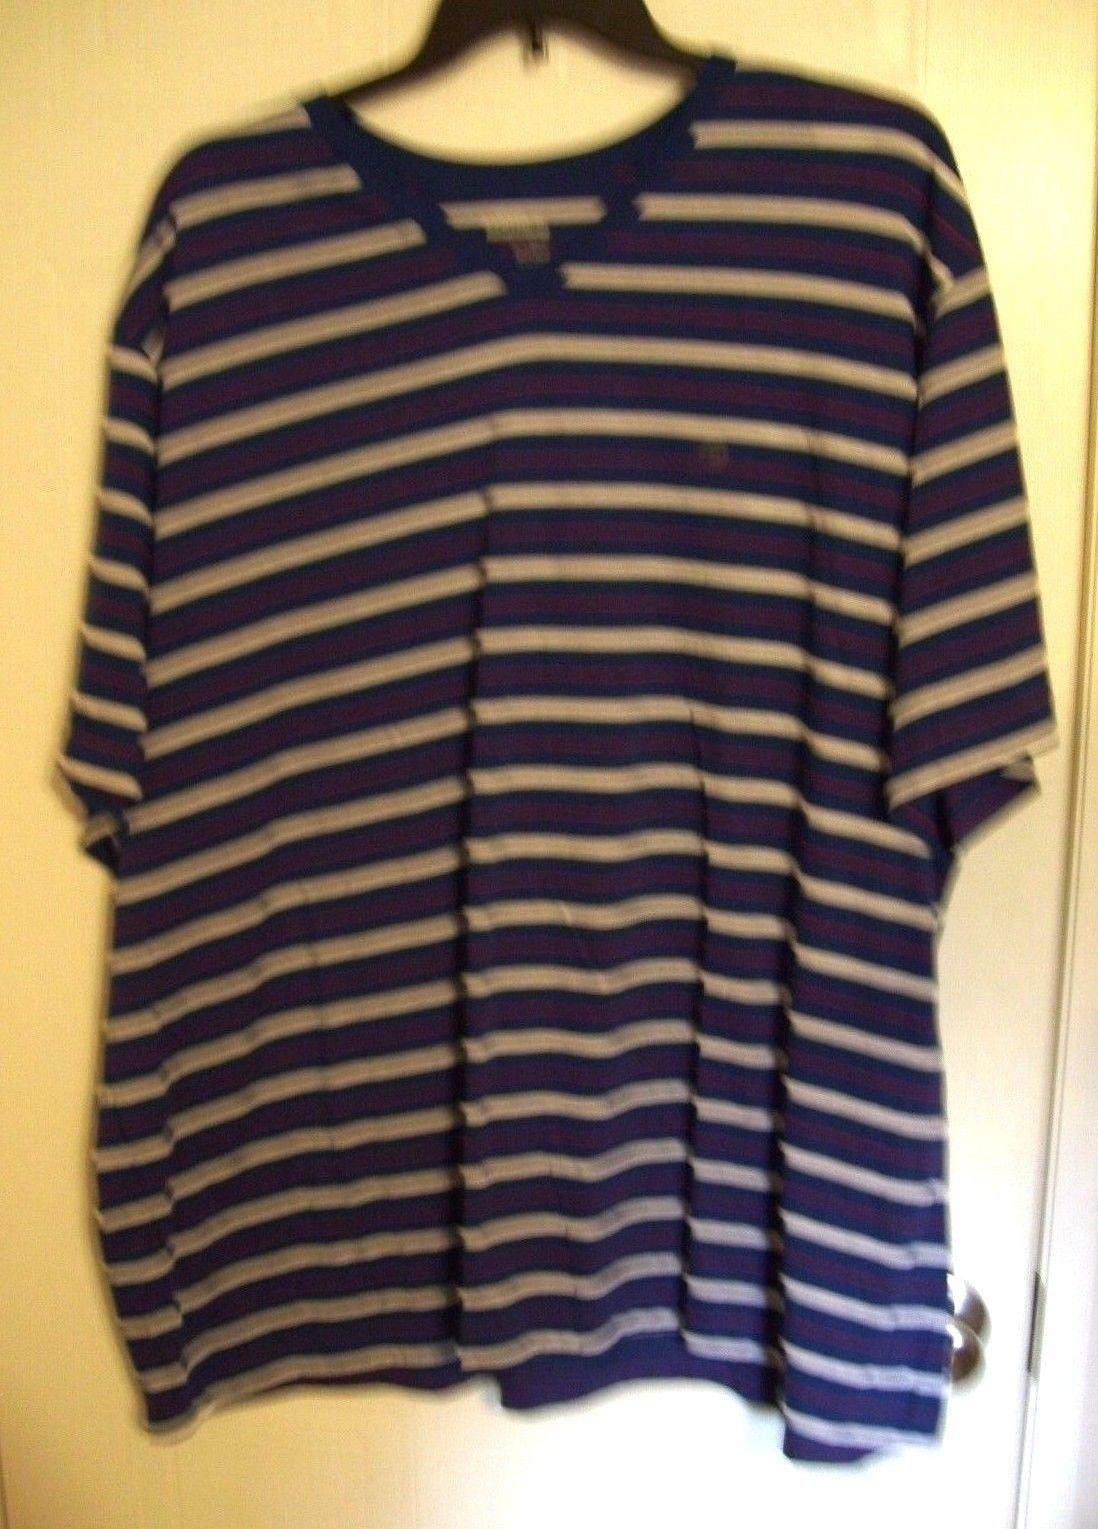 5bb386bdd4 Basic Editions Big Men's Casual Striped V-Neck Short Sleeve Shirt - Size:  4XL